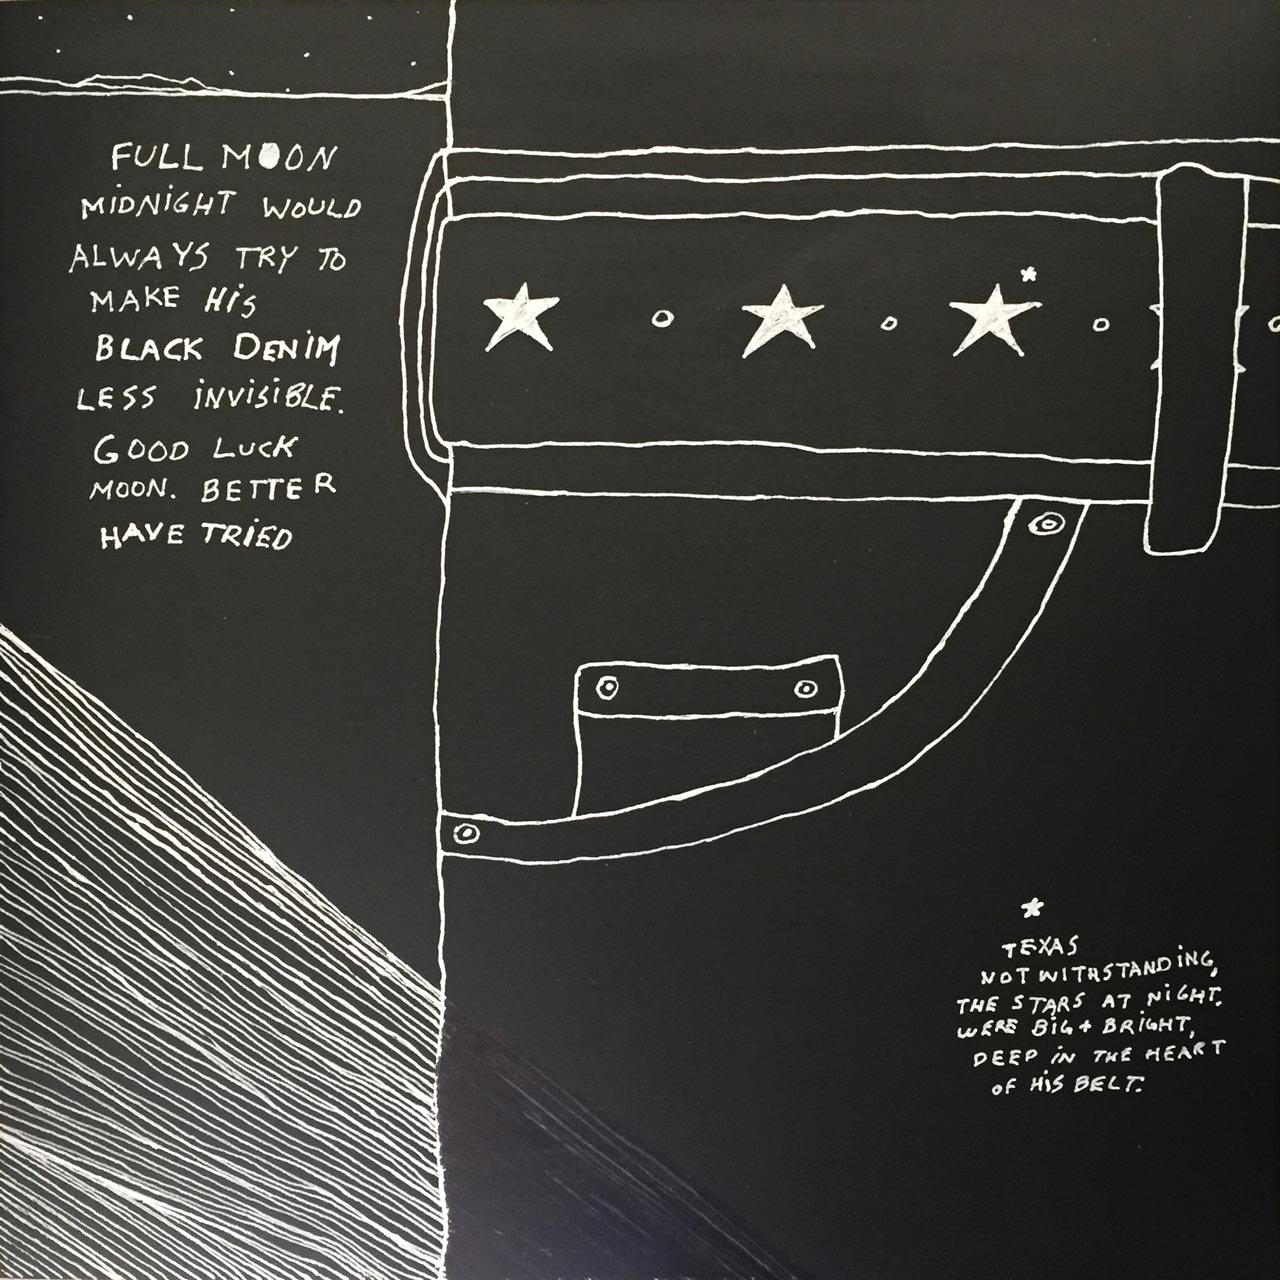 "'Black Denim Moonlight.' 12"" x 12"" pen and ink on wood panel."